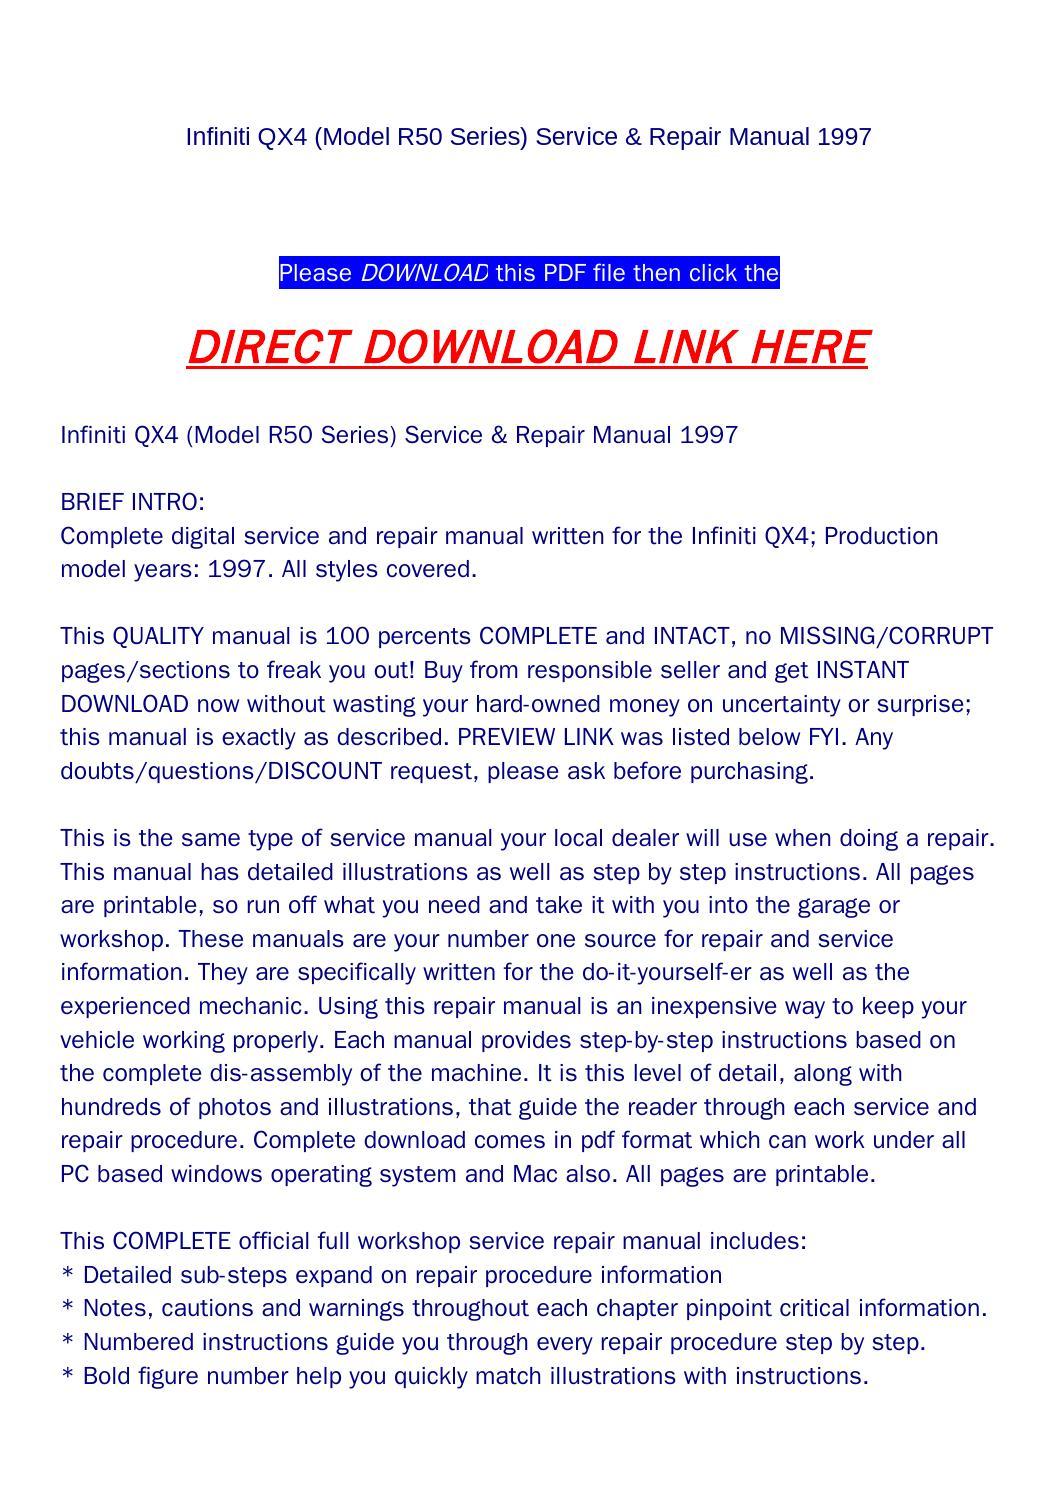 infiniti qx4 model r50 series service repair manual. Black Bedroom Furniture Sets. Home Design Ideas